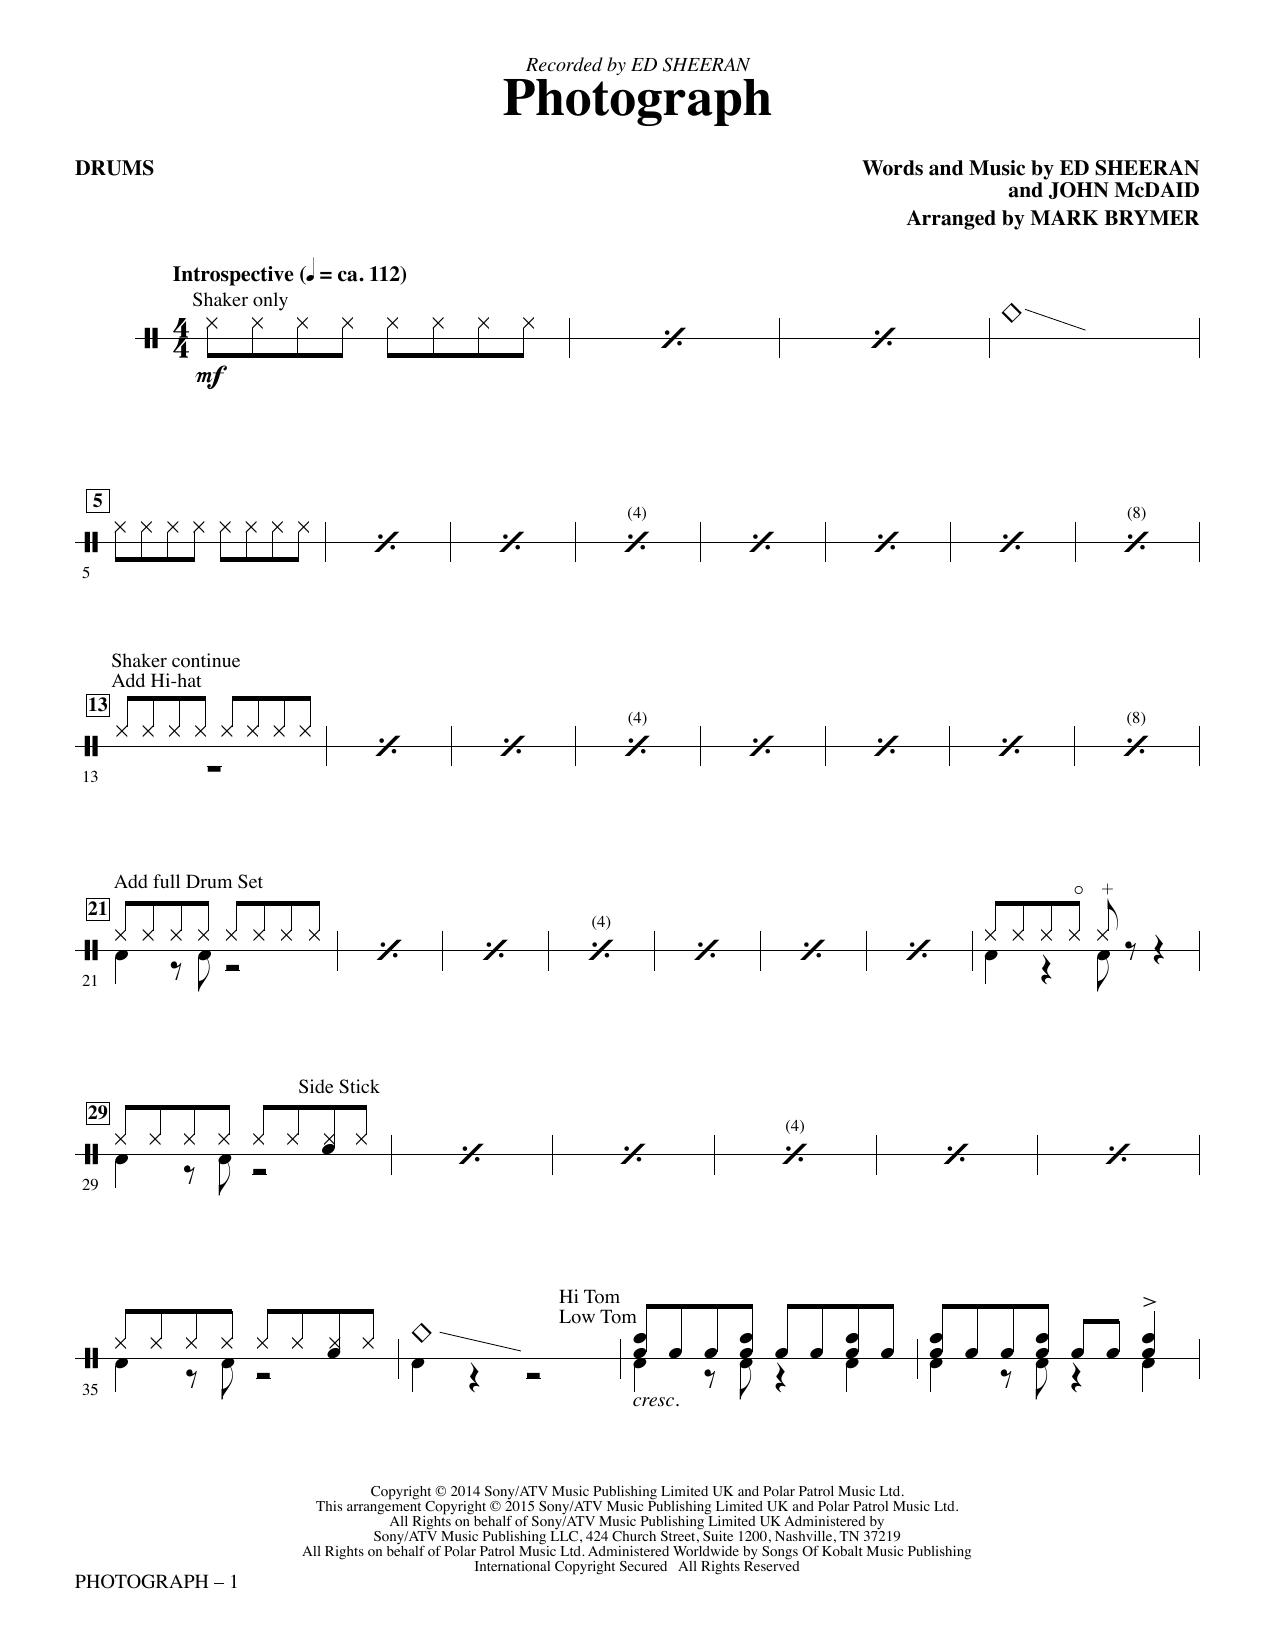 Photograph - Drums sheet music